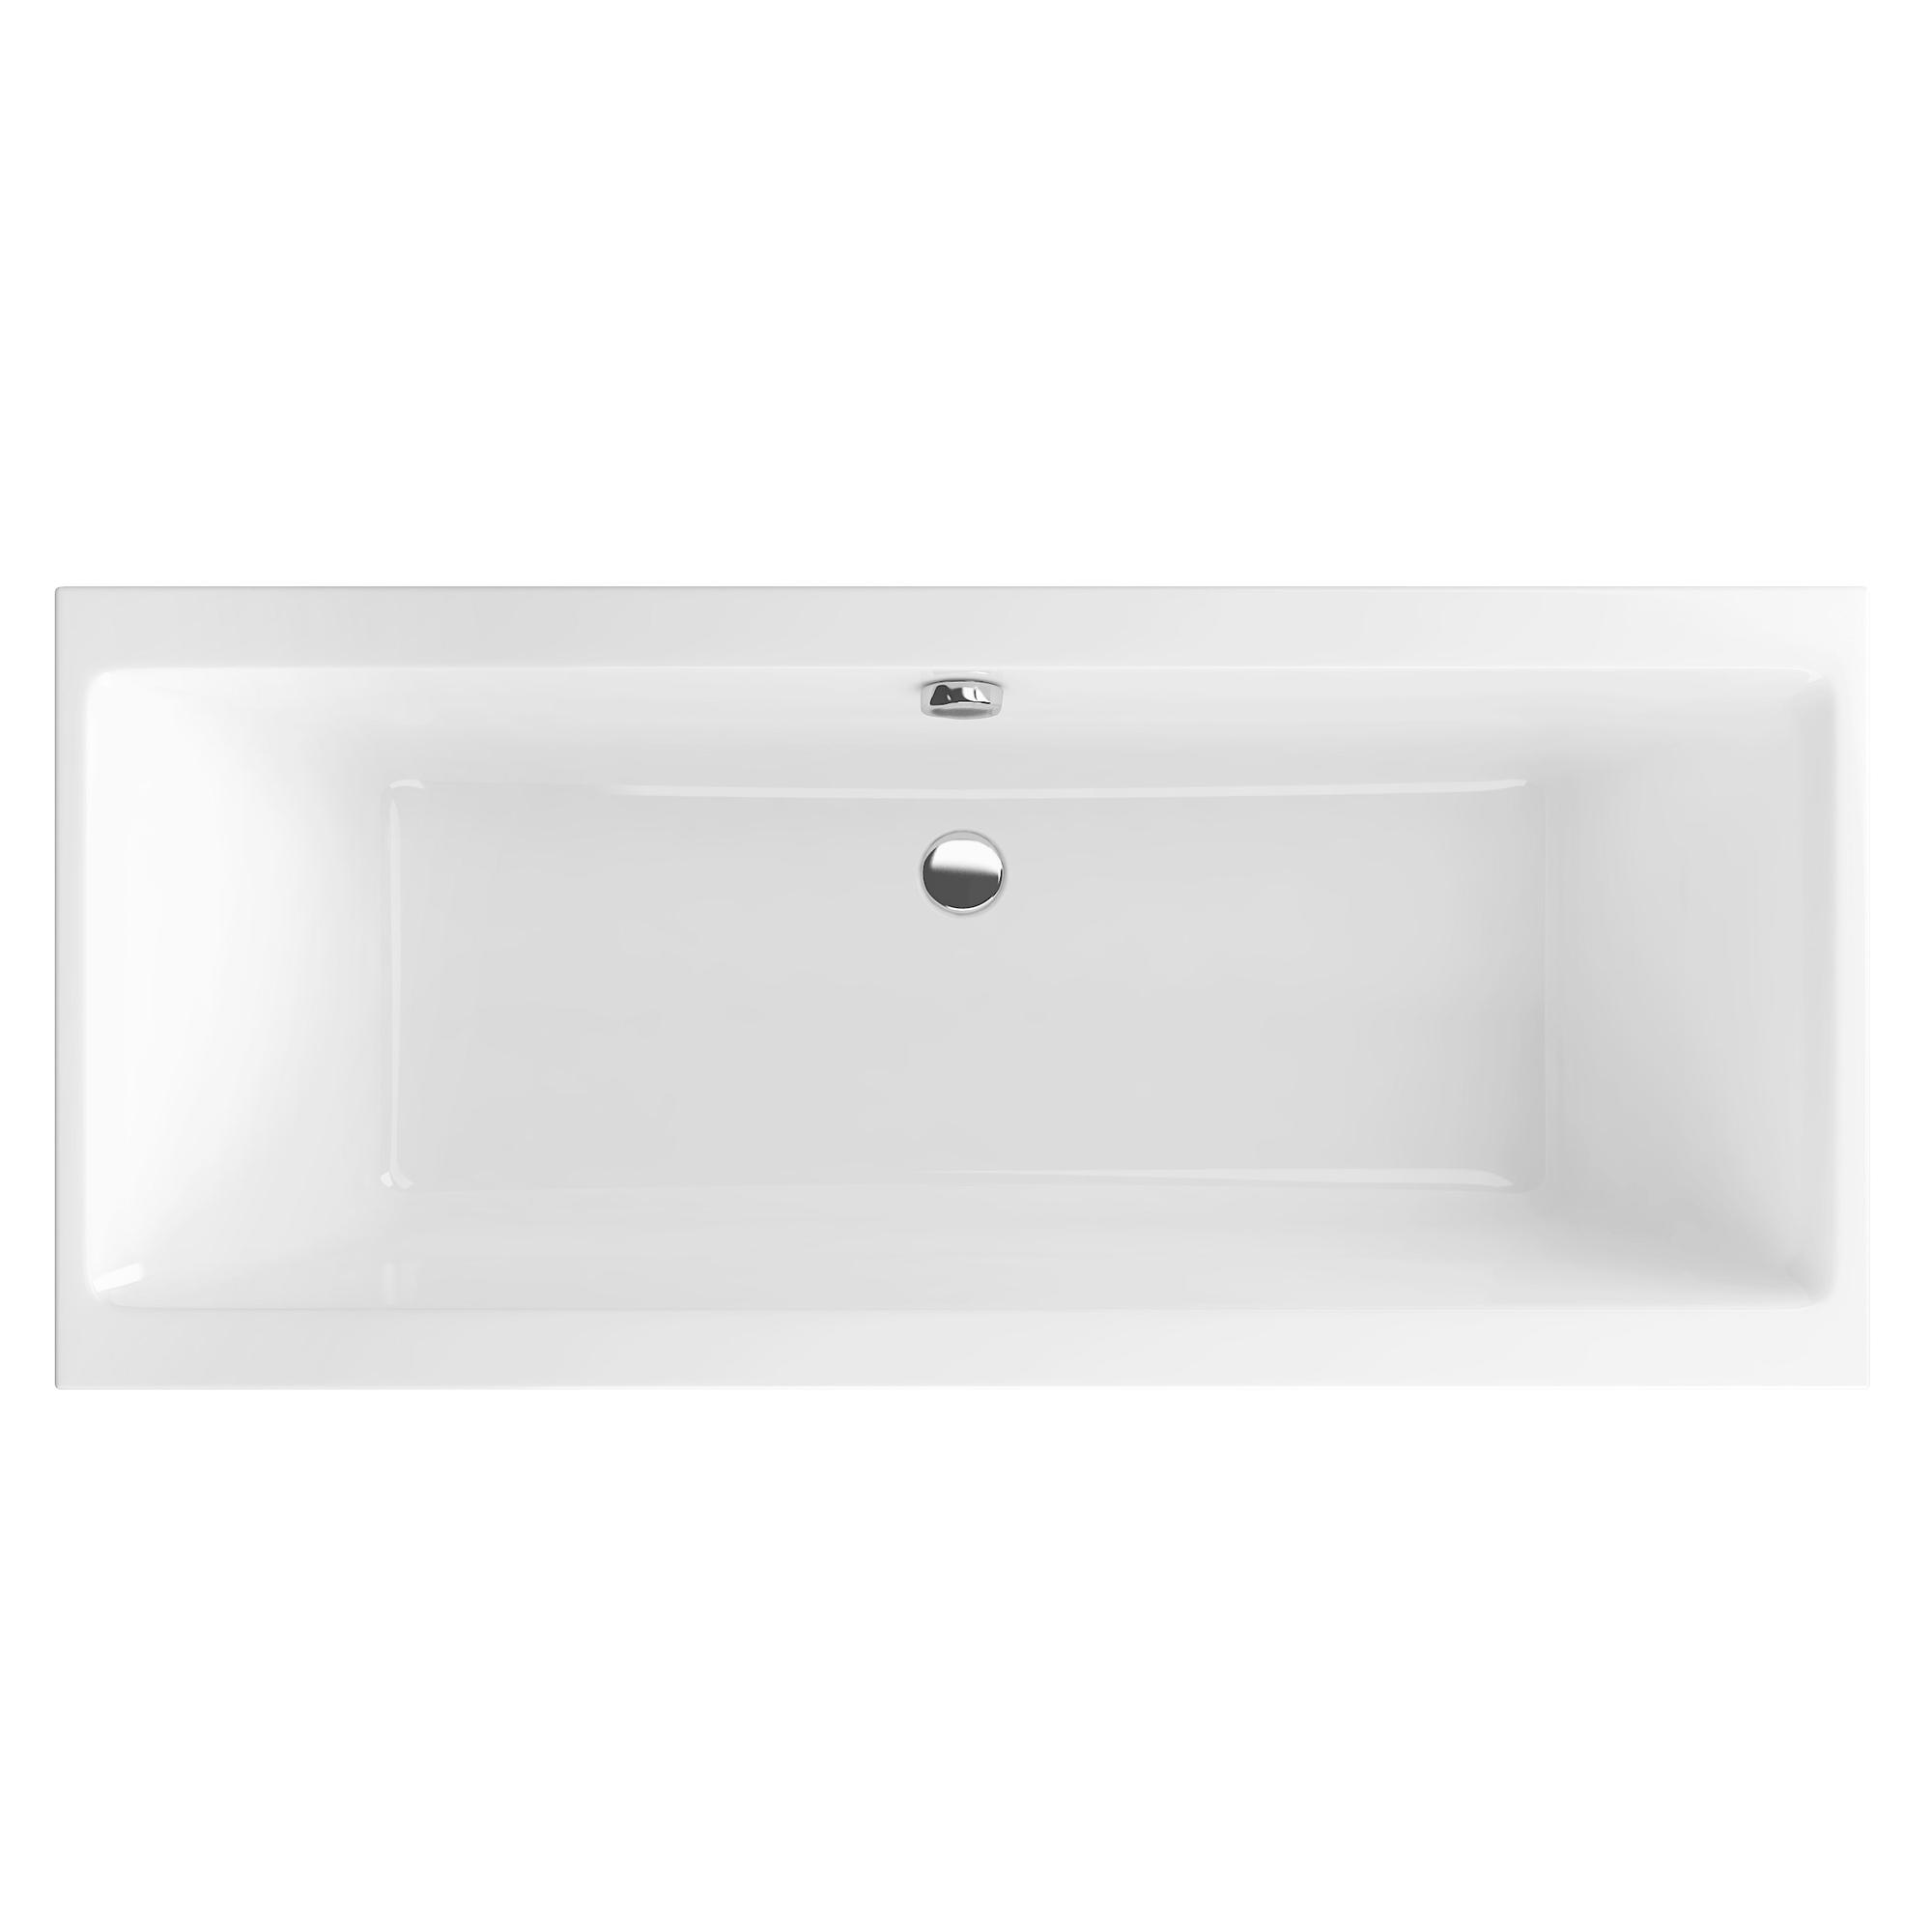 Акриловая ванна Excellent Pryzmat Slim 160x75 без гидромассажа excellent акриловая ванна excellent pryzmat lux 180x80 waex prl18wh